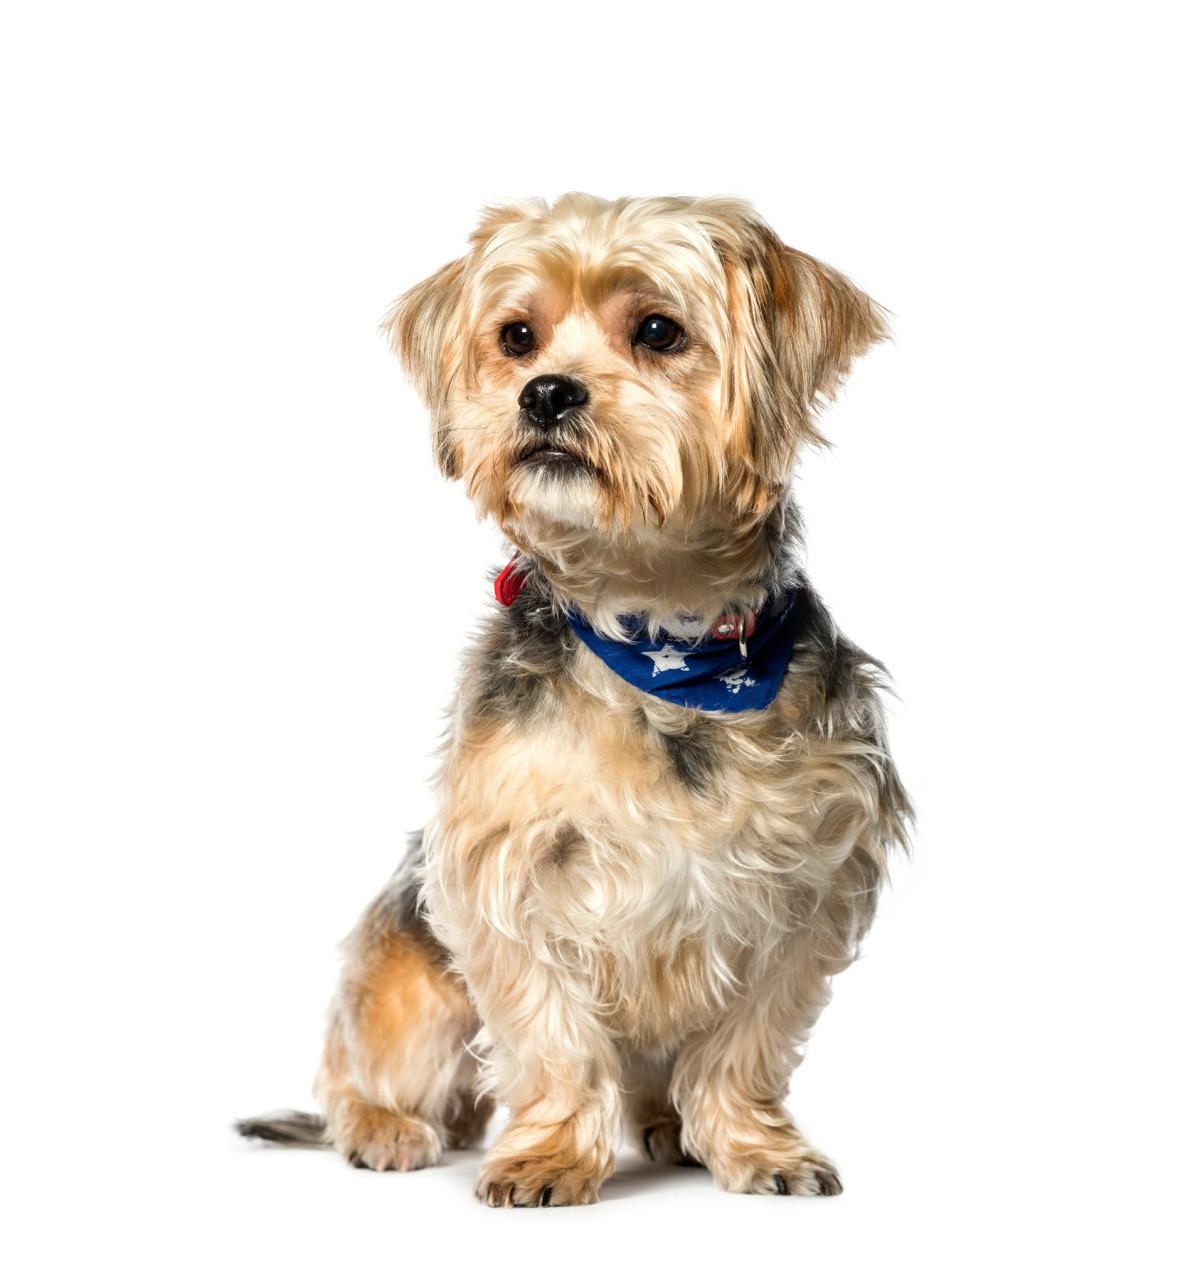 Shih Tzu Yorkshire Terrier Mix Shorkie